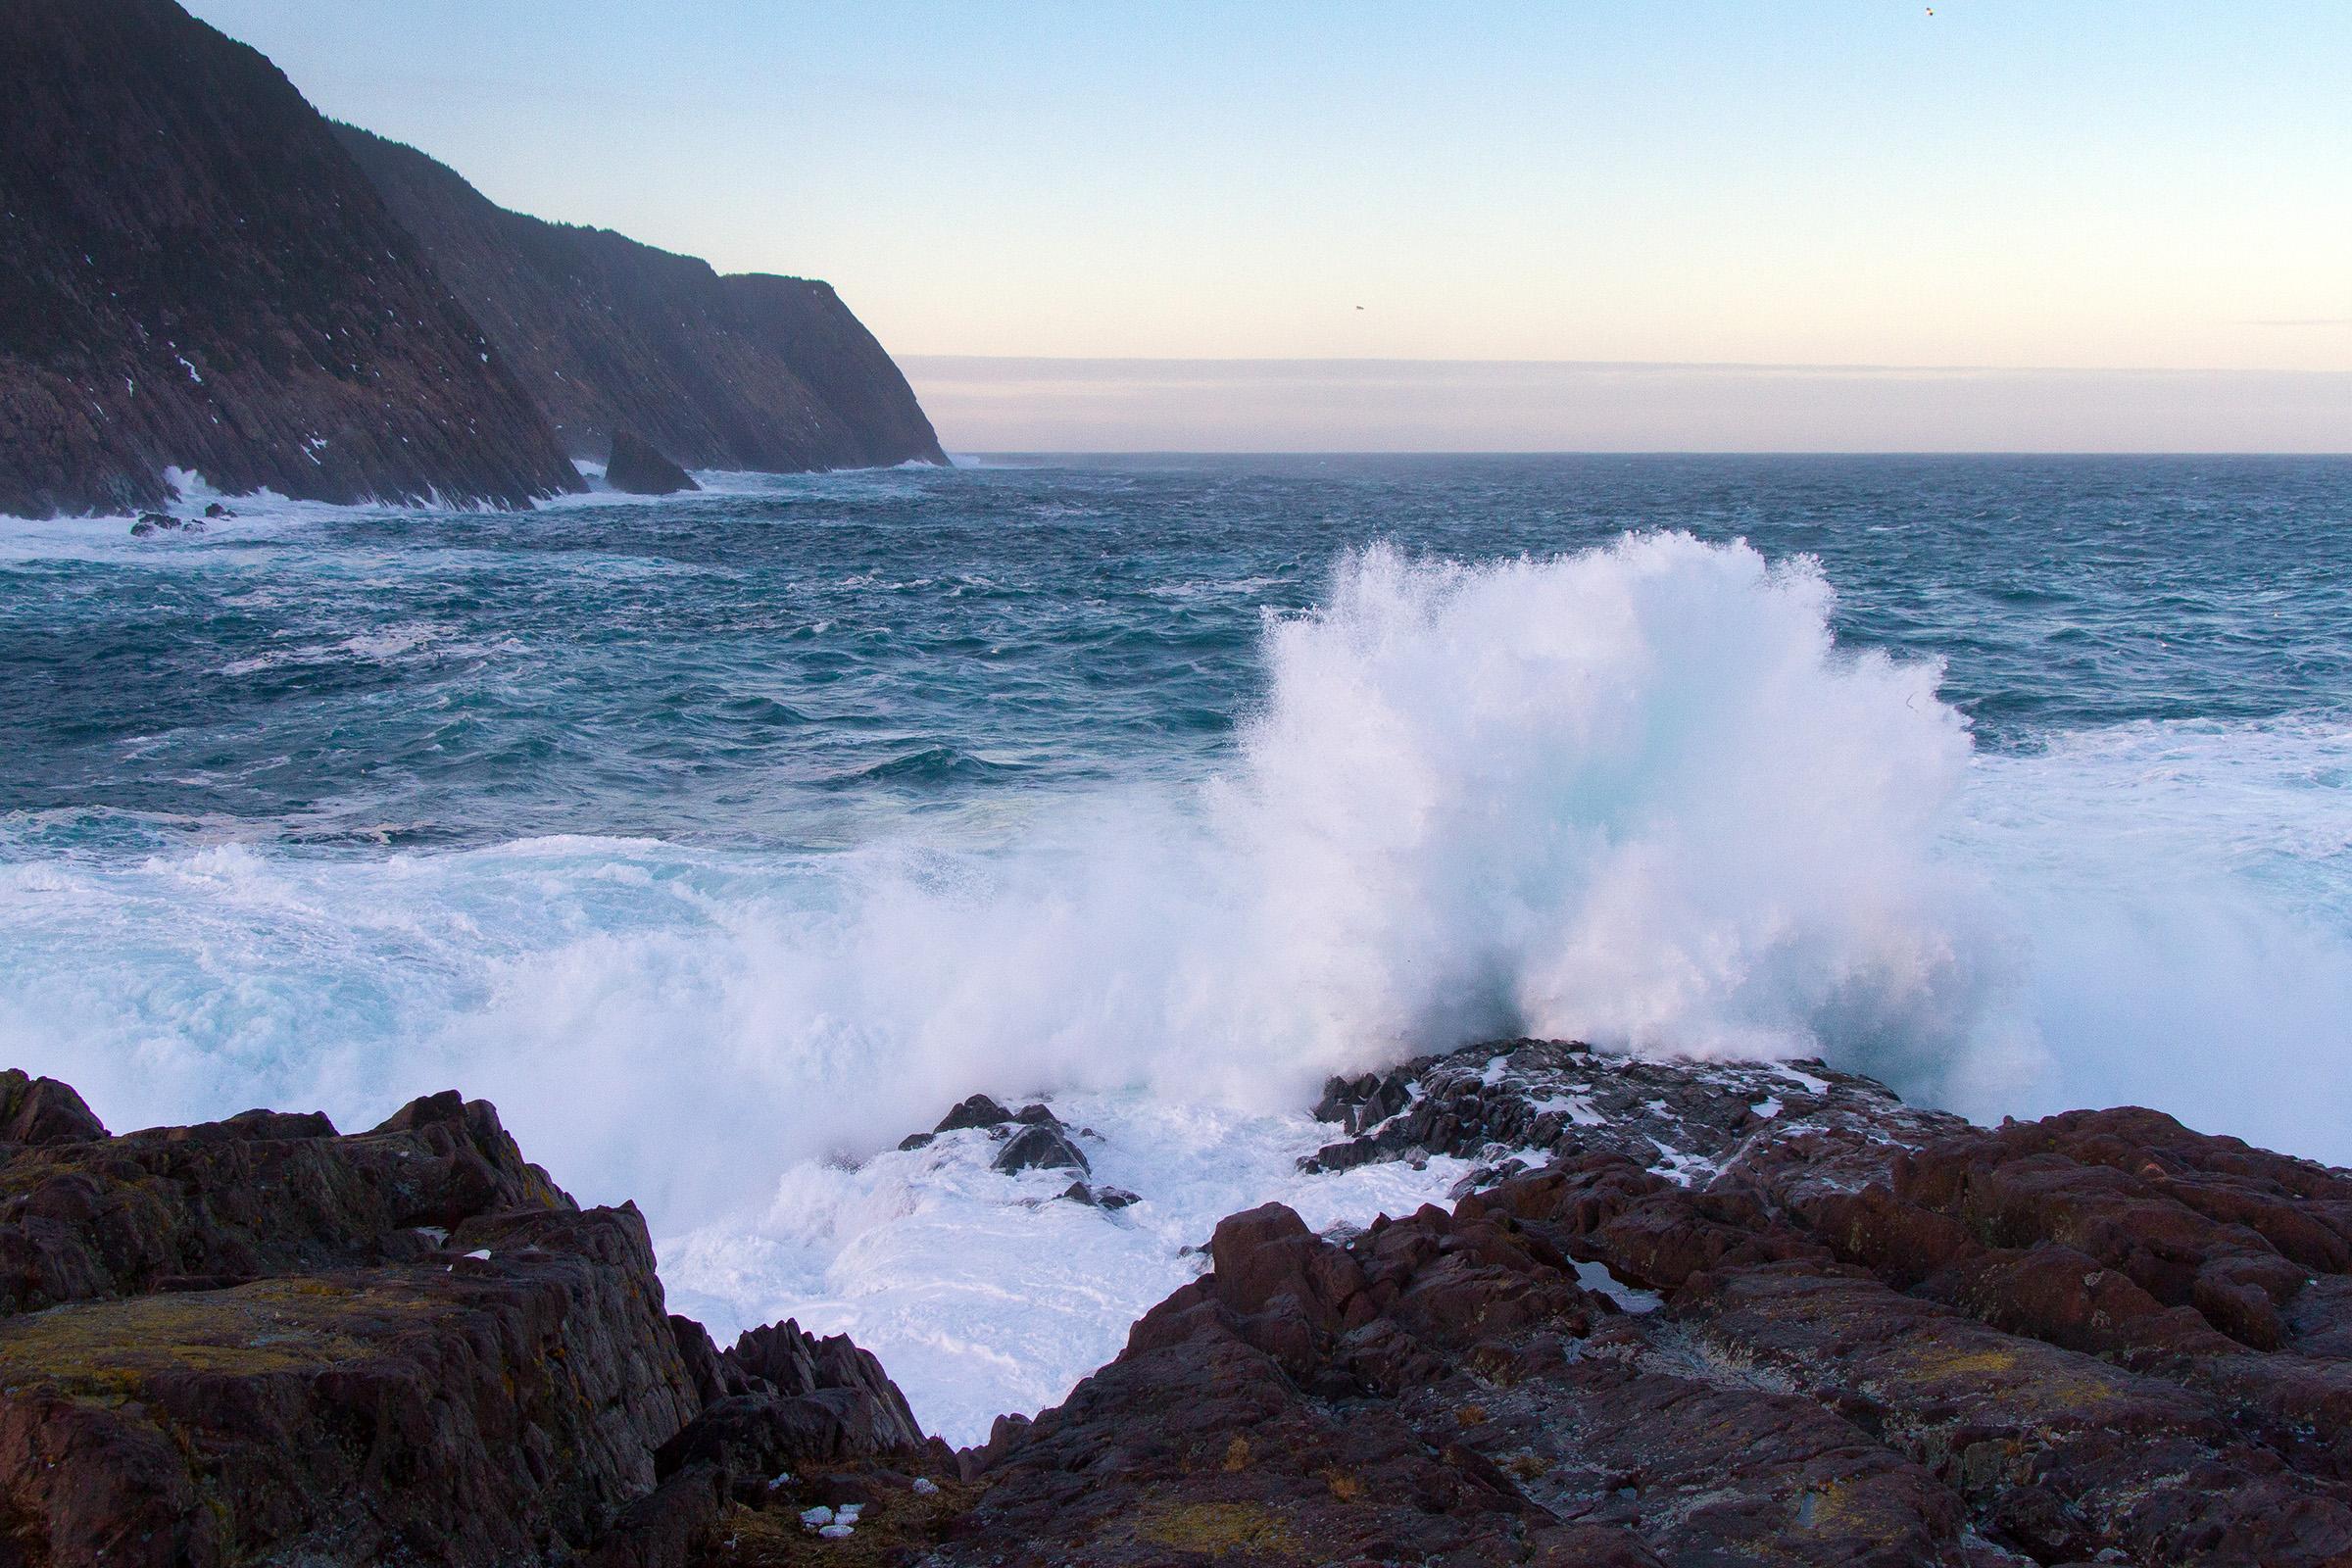 Waves, Abstract, Splash, Photo, Power, HQ Photo